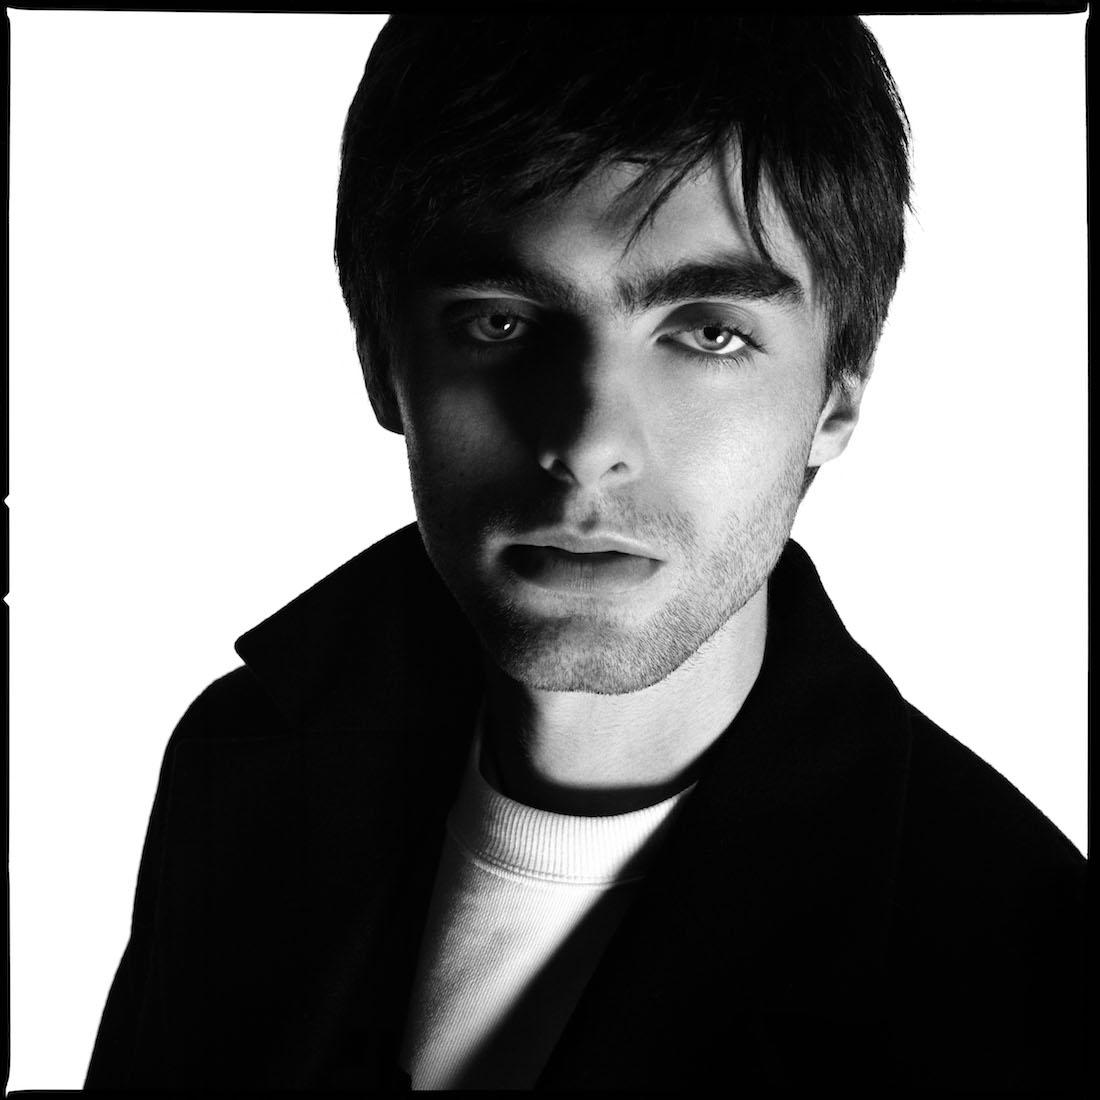 177 5619 Lennon Gallagher Zara Man Z 6